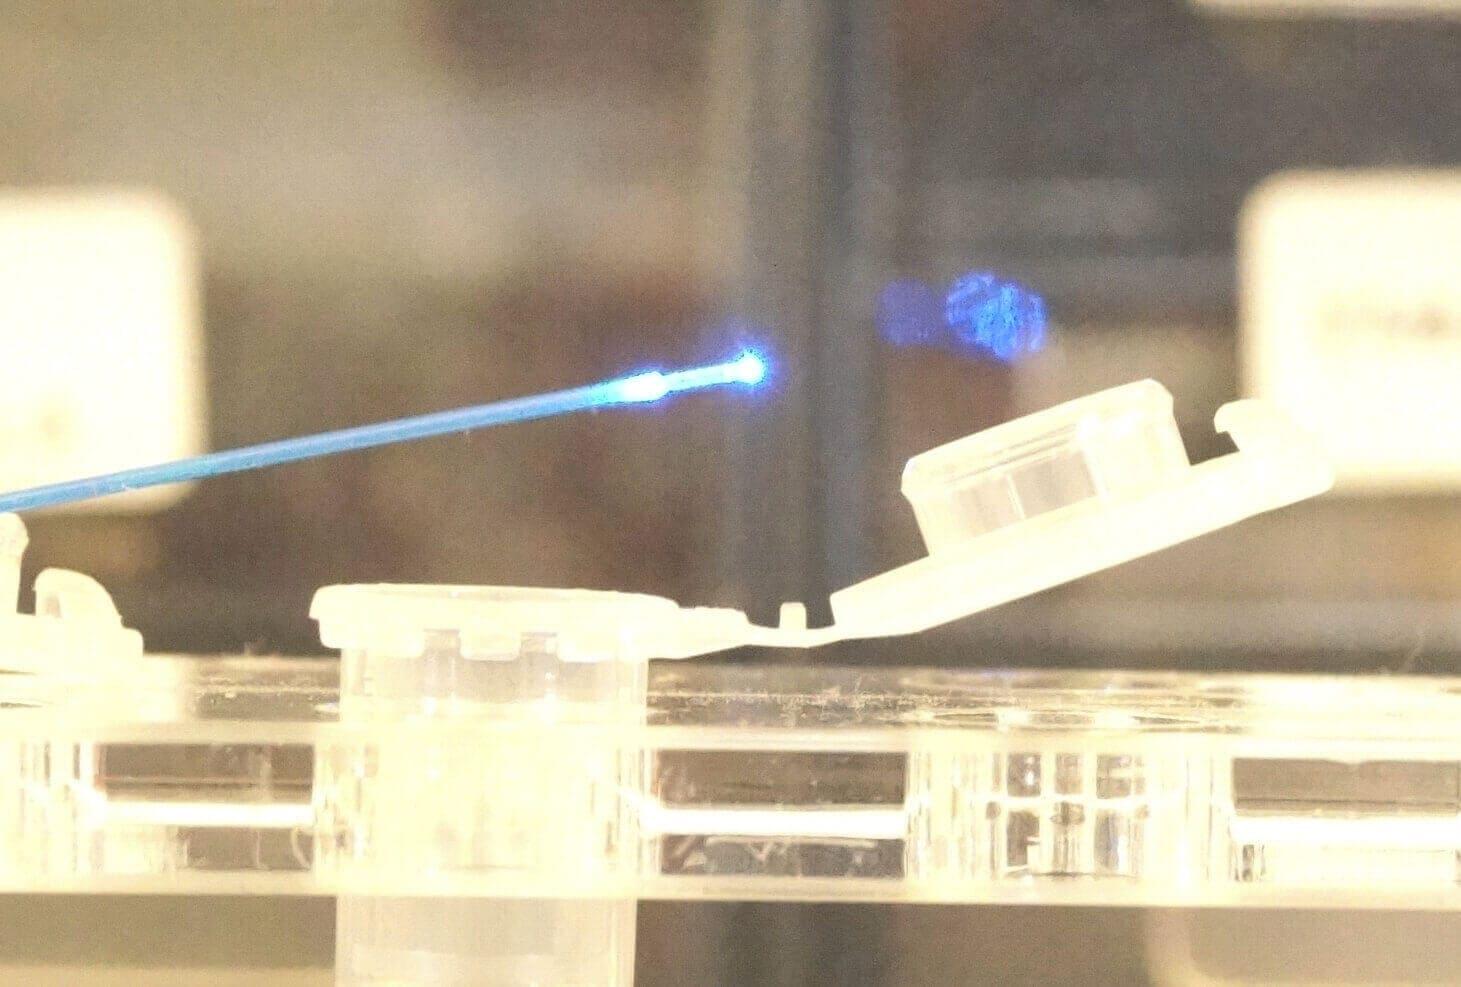 Optoreader Fluorescence on Pto Pressure Sensor